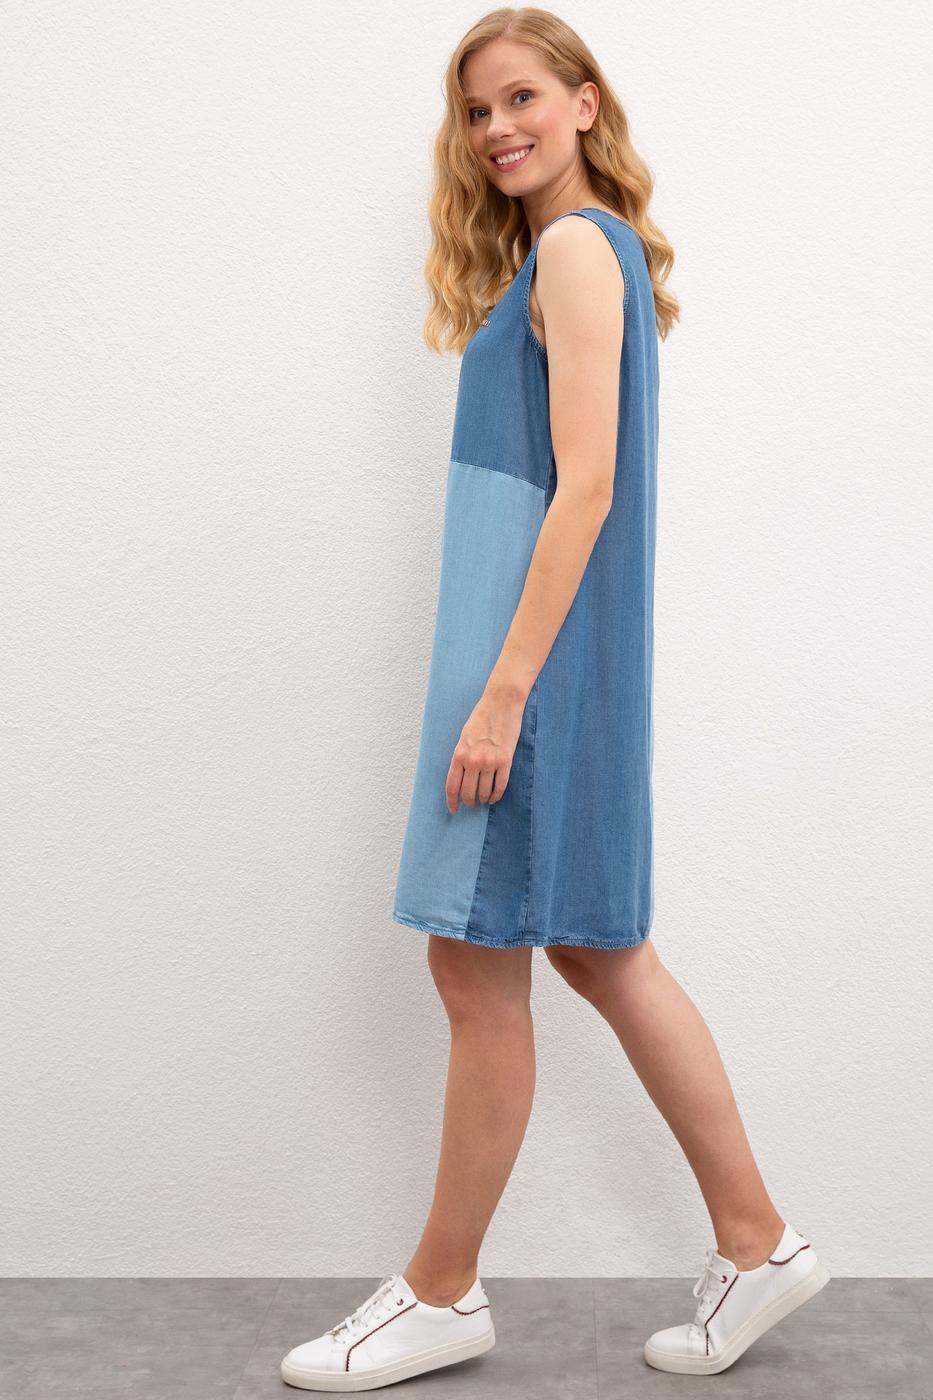 Mavi Denim Elbise